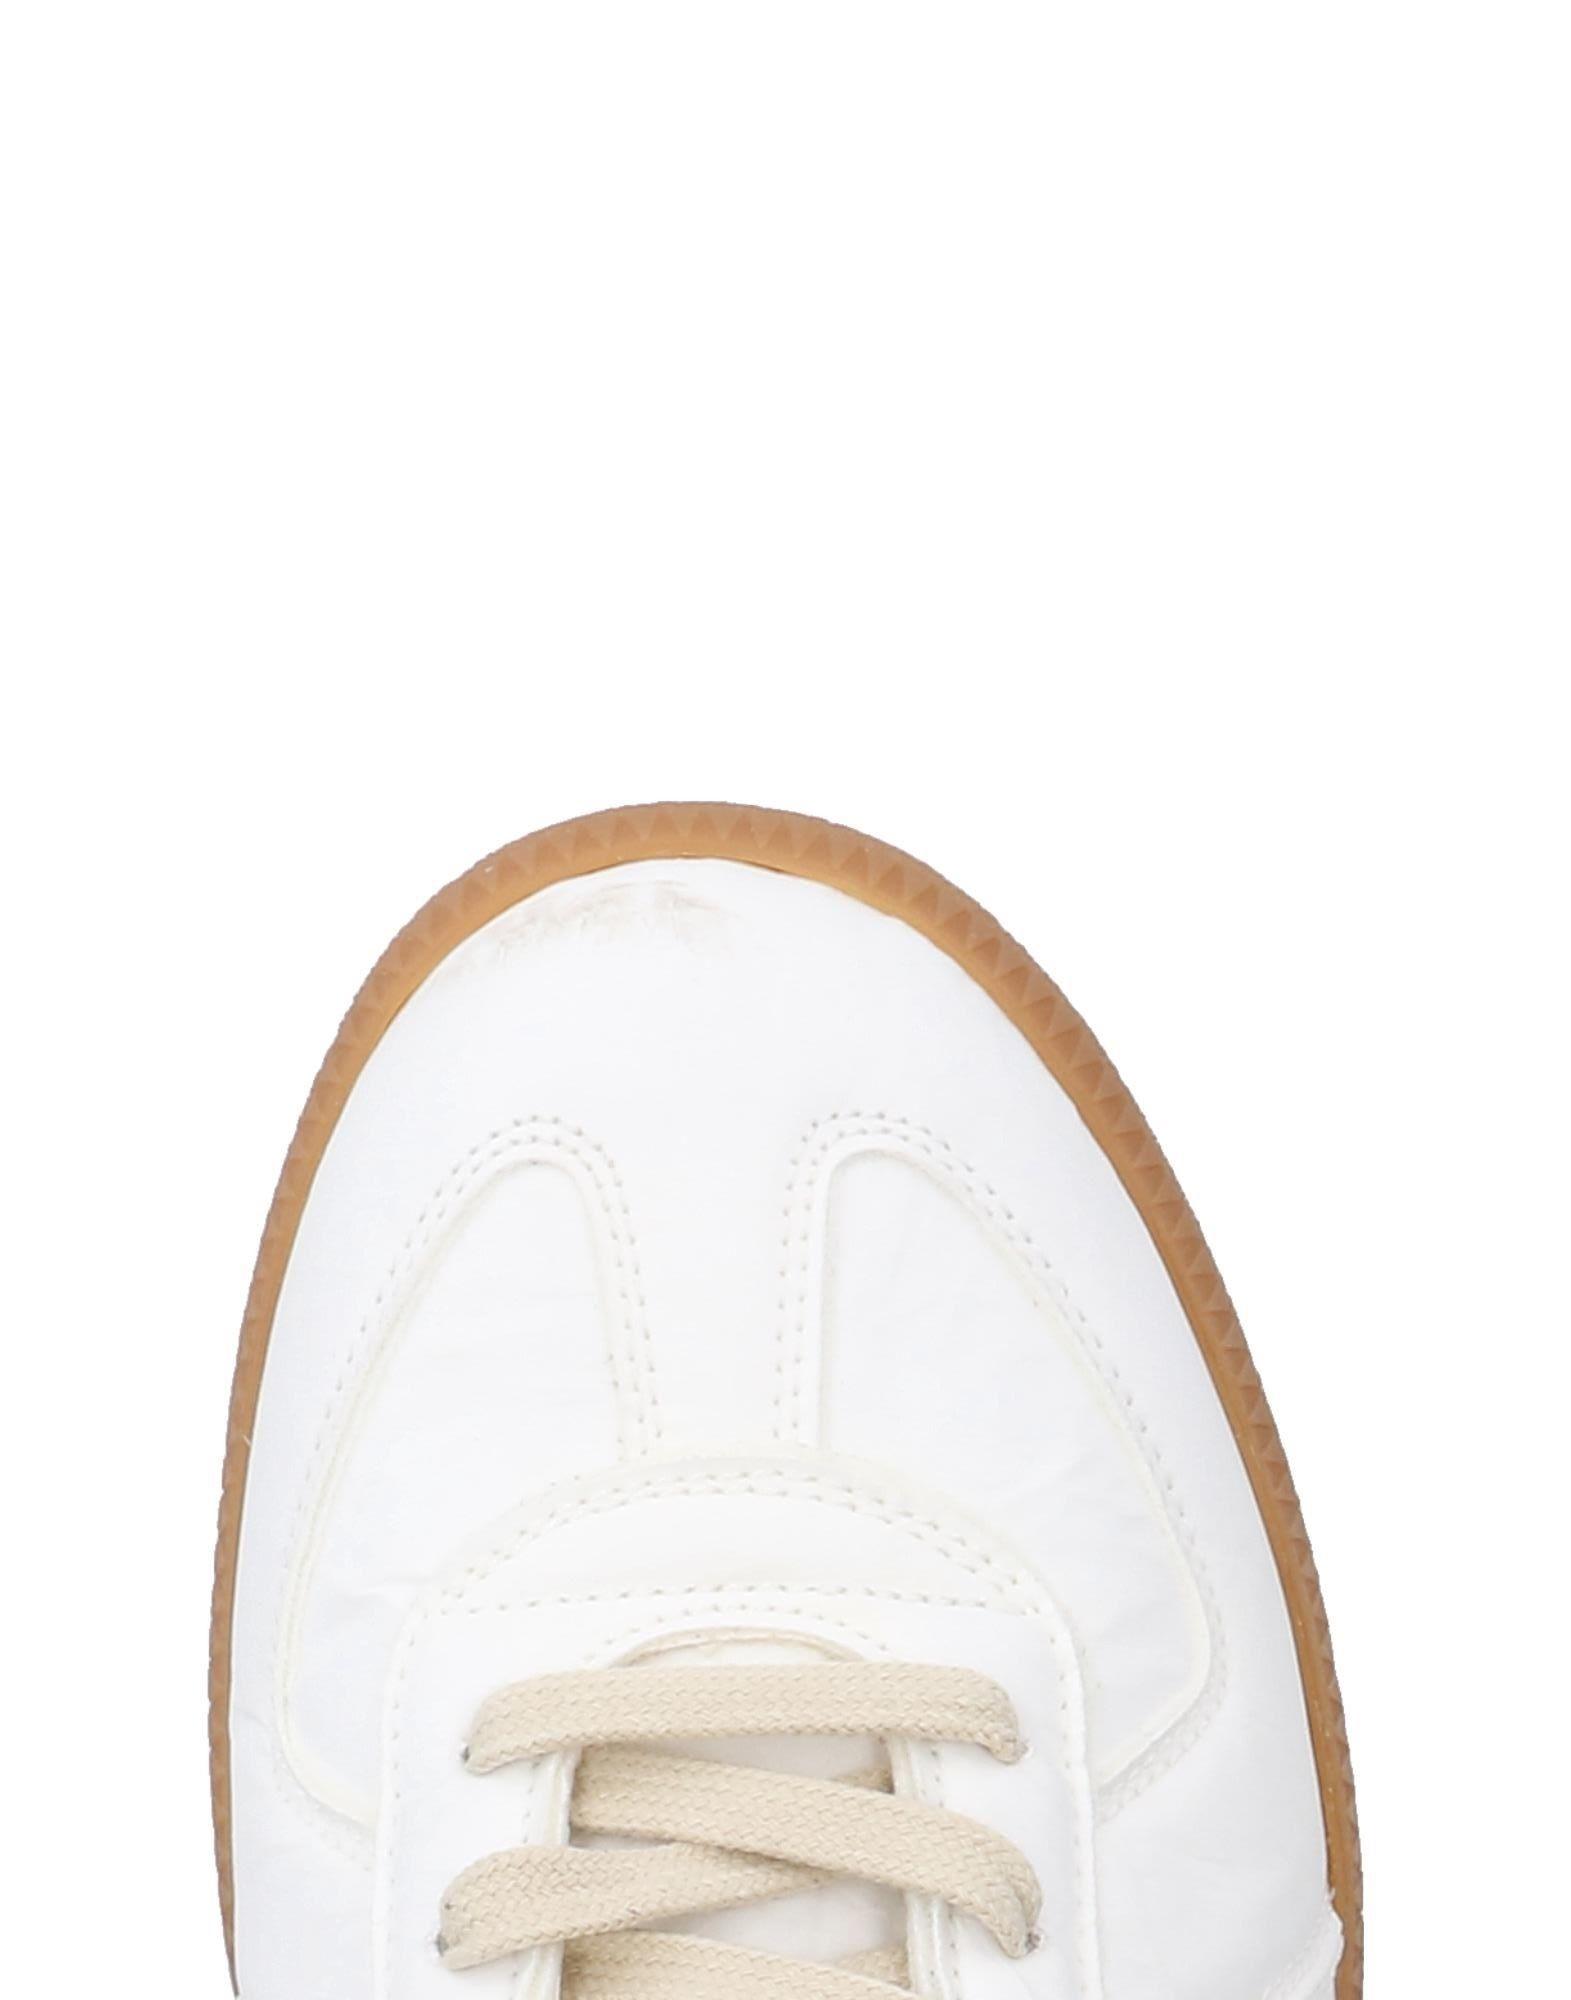 Maison Margiela Sneakers Herren  11500056QF Gute Gute Gute Qualität beliebte Schuhe be50c4